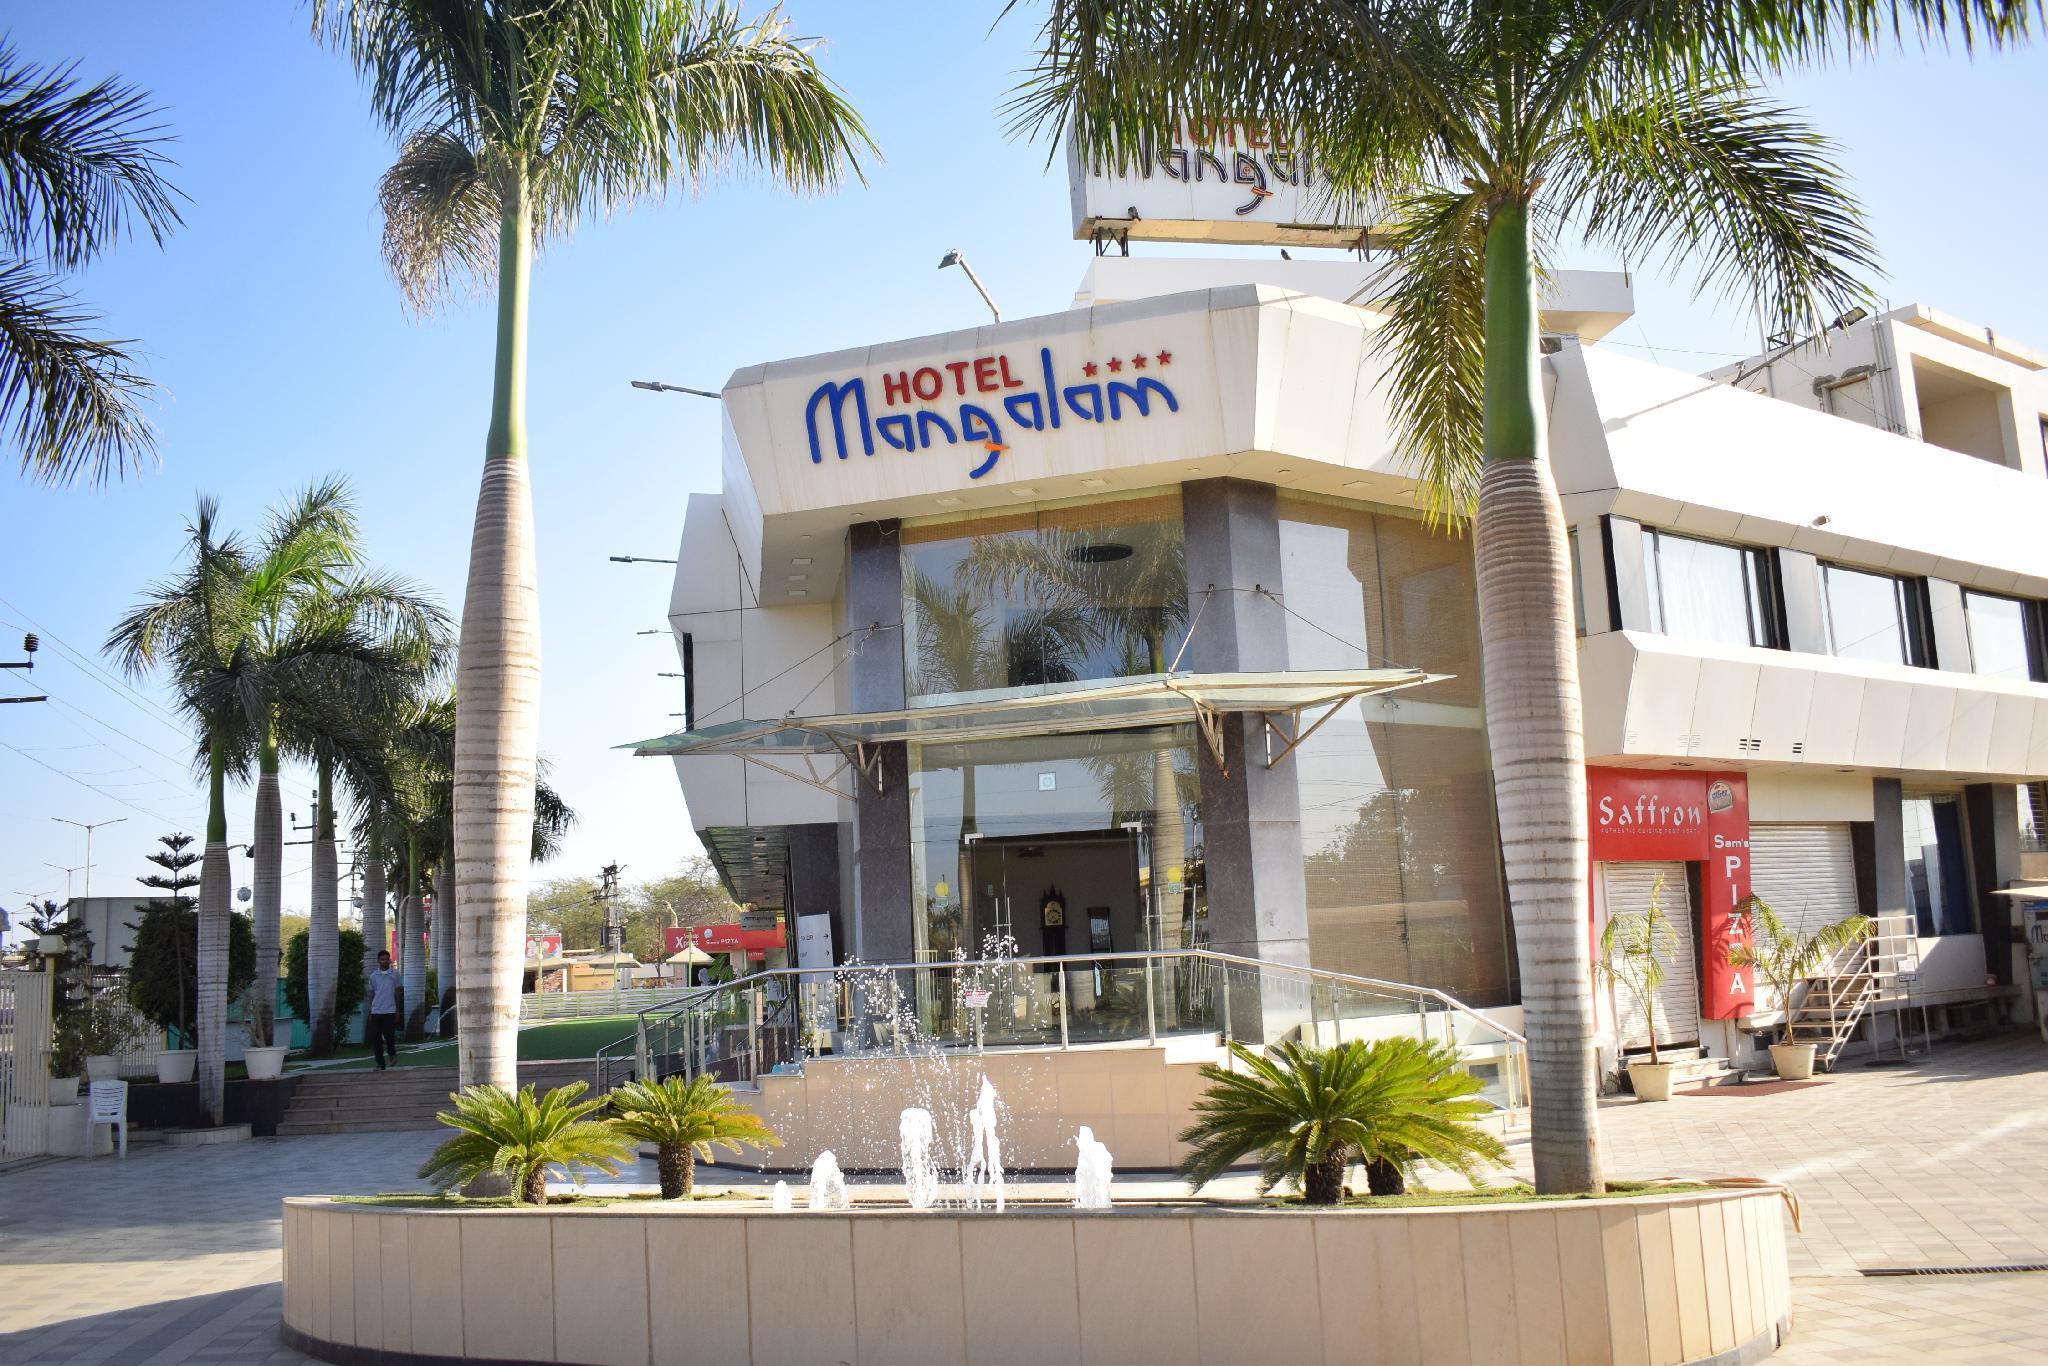 Hotel Mangalam - Bhuj, Kachchh